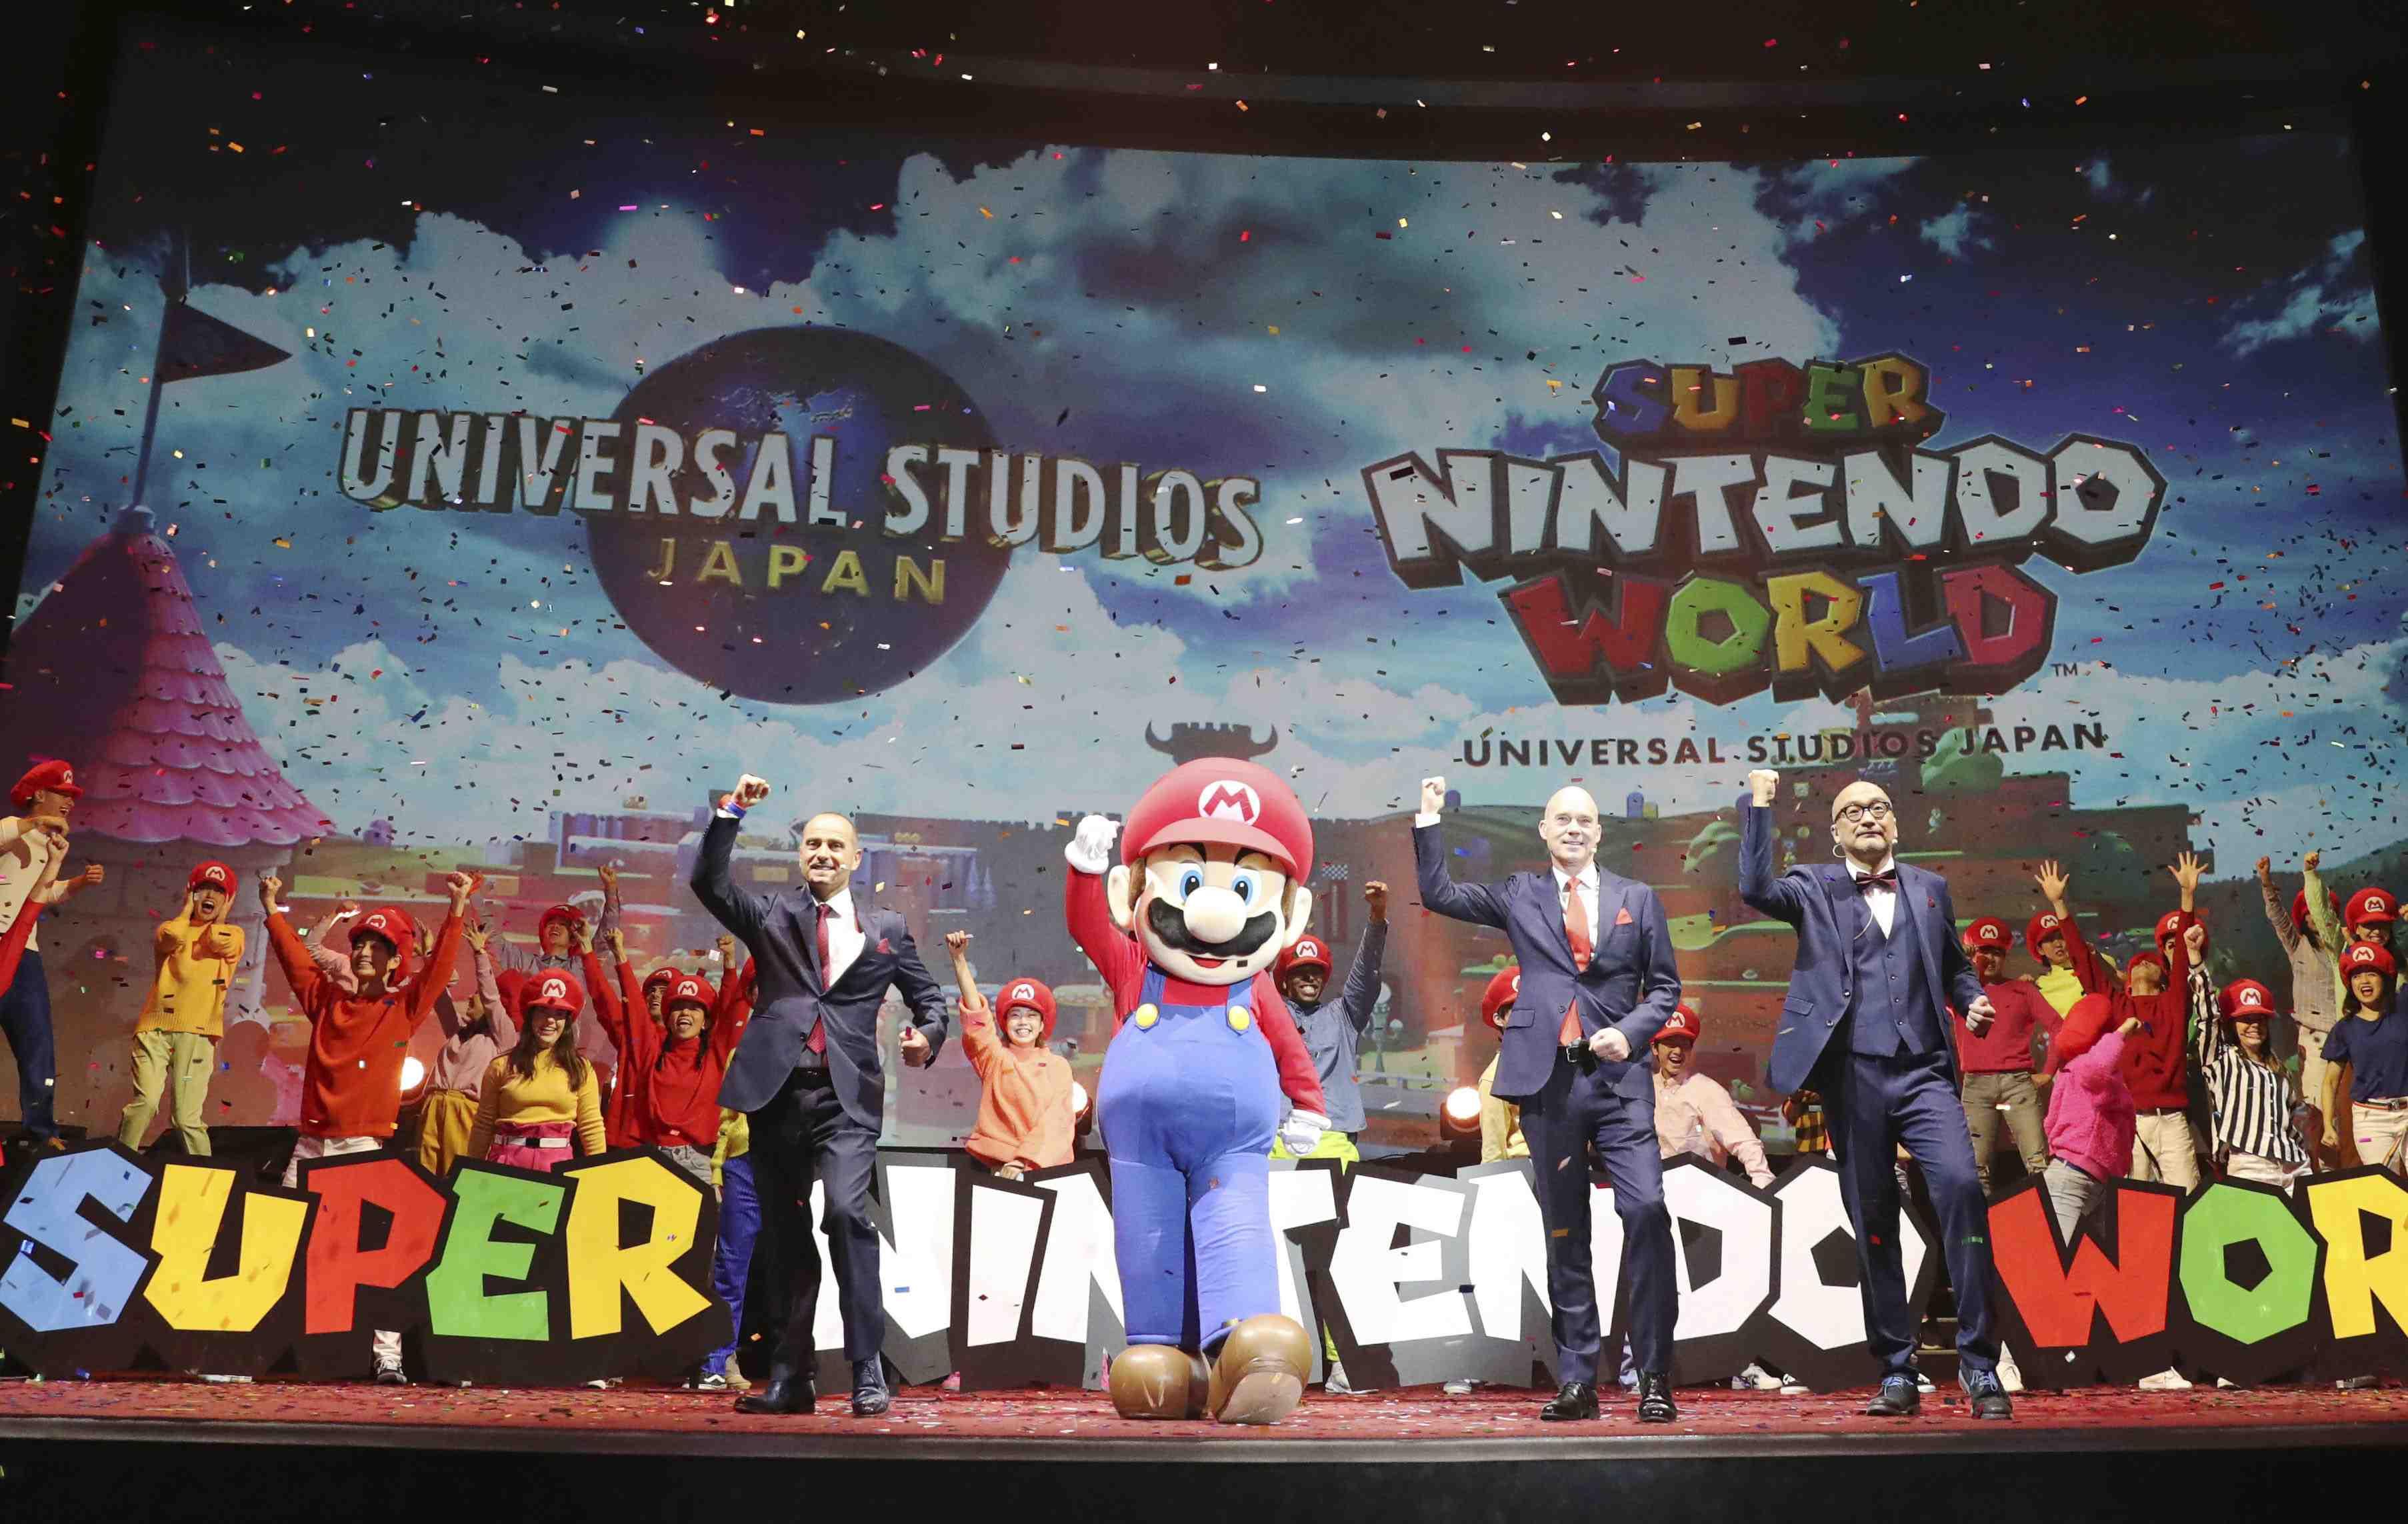 Nintendo Mario's World at USJ 002